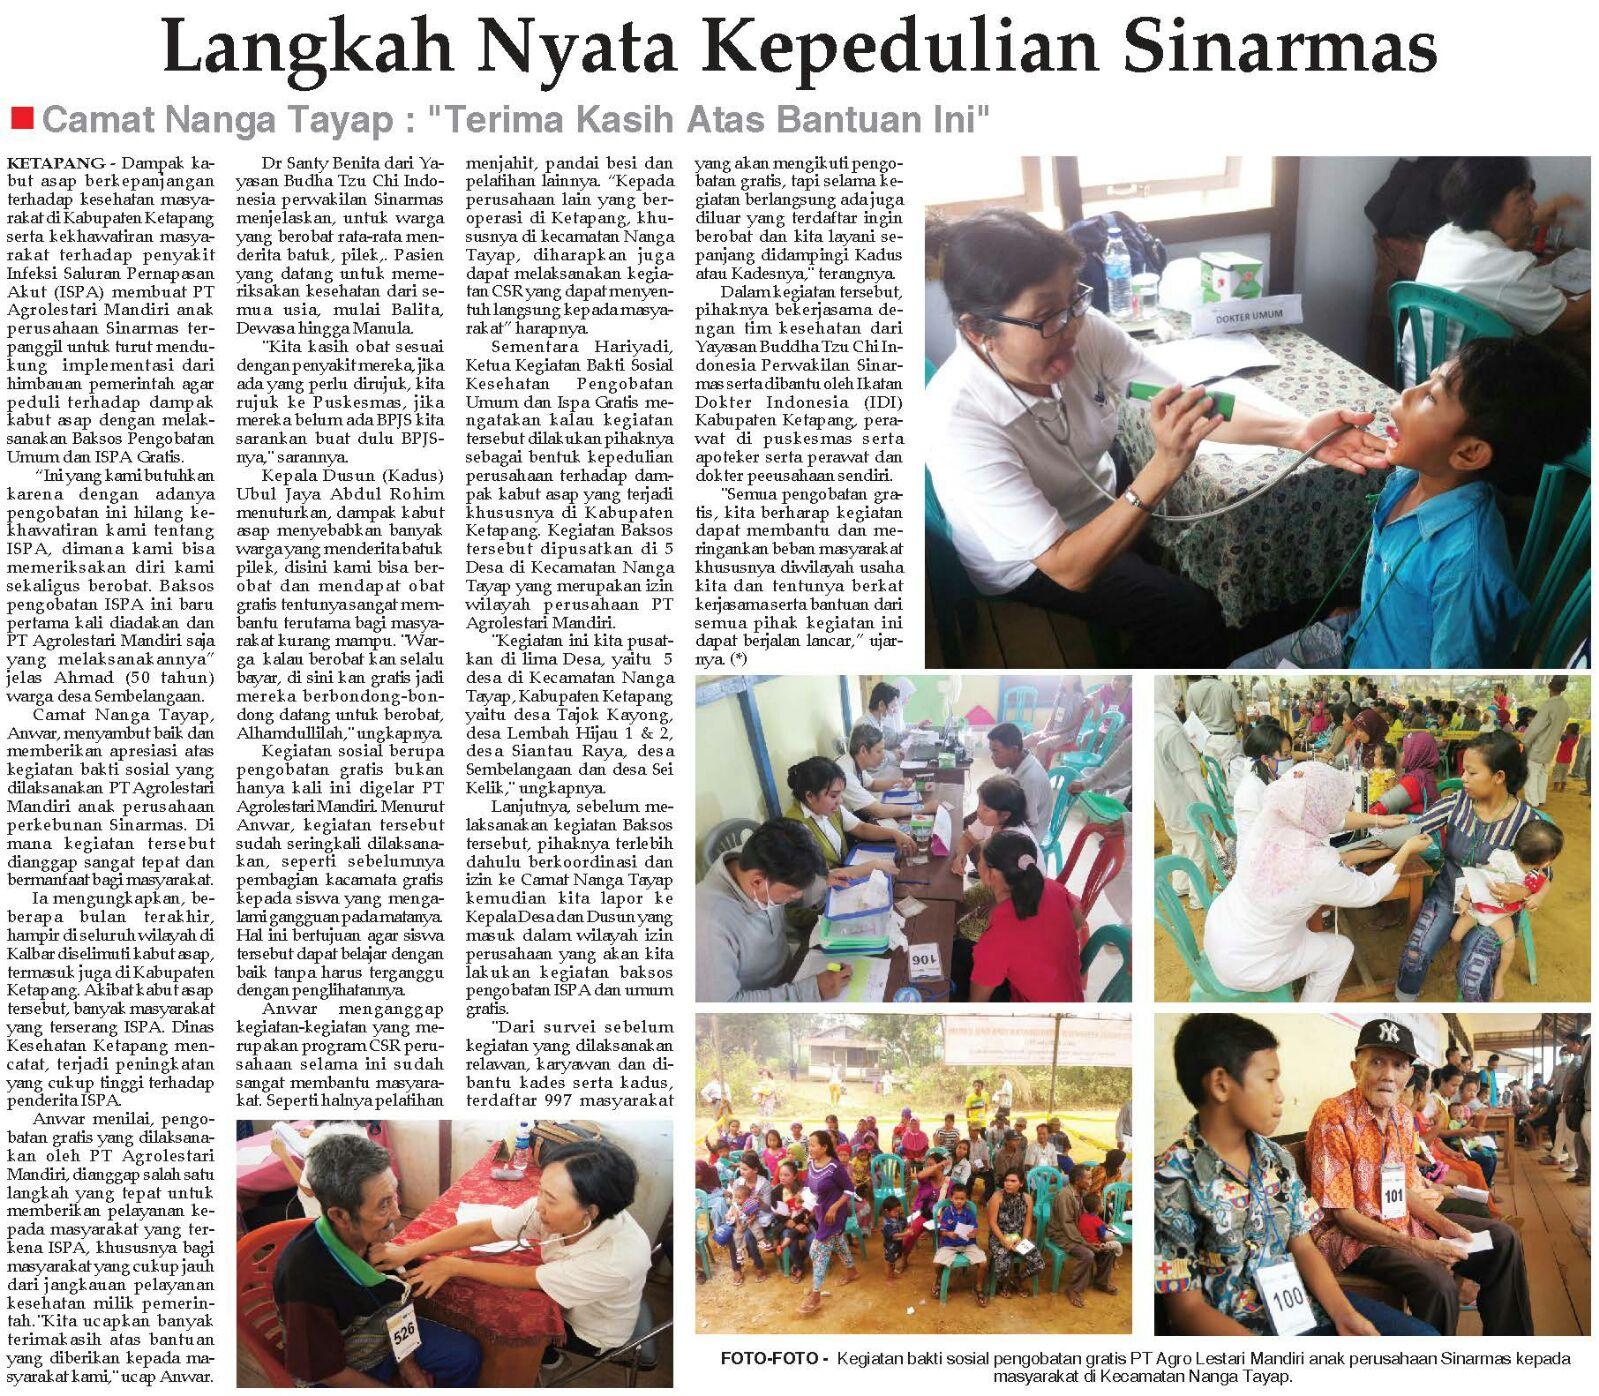 Mobile free clinics at Kecamatan Nanga Tayap and Kabupaten Ketapan